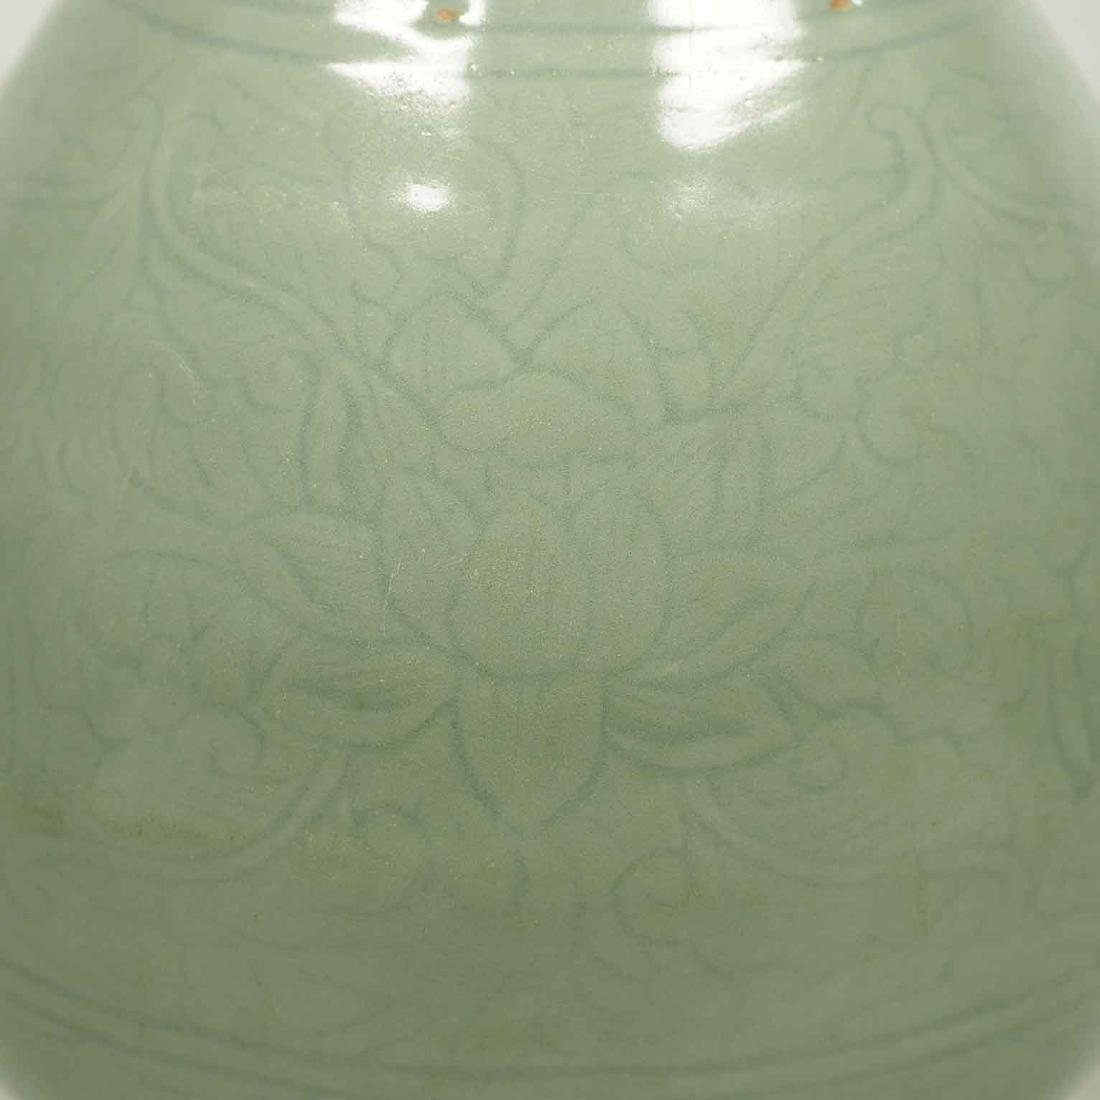 Longquan Yuhuchun Vase, Yuan-early Ming Dynasty - 4